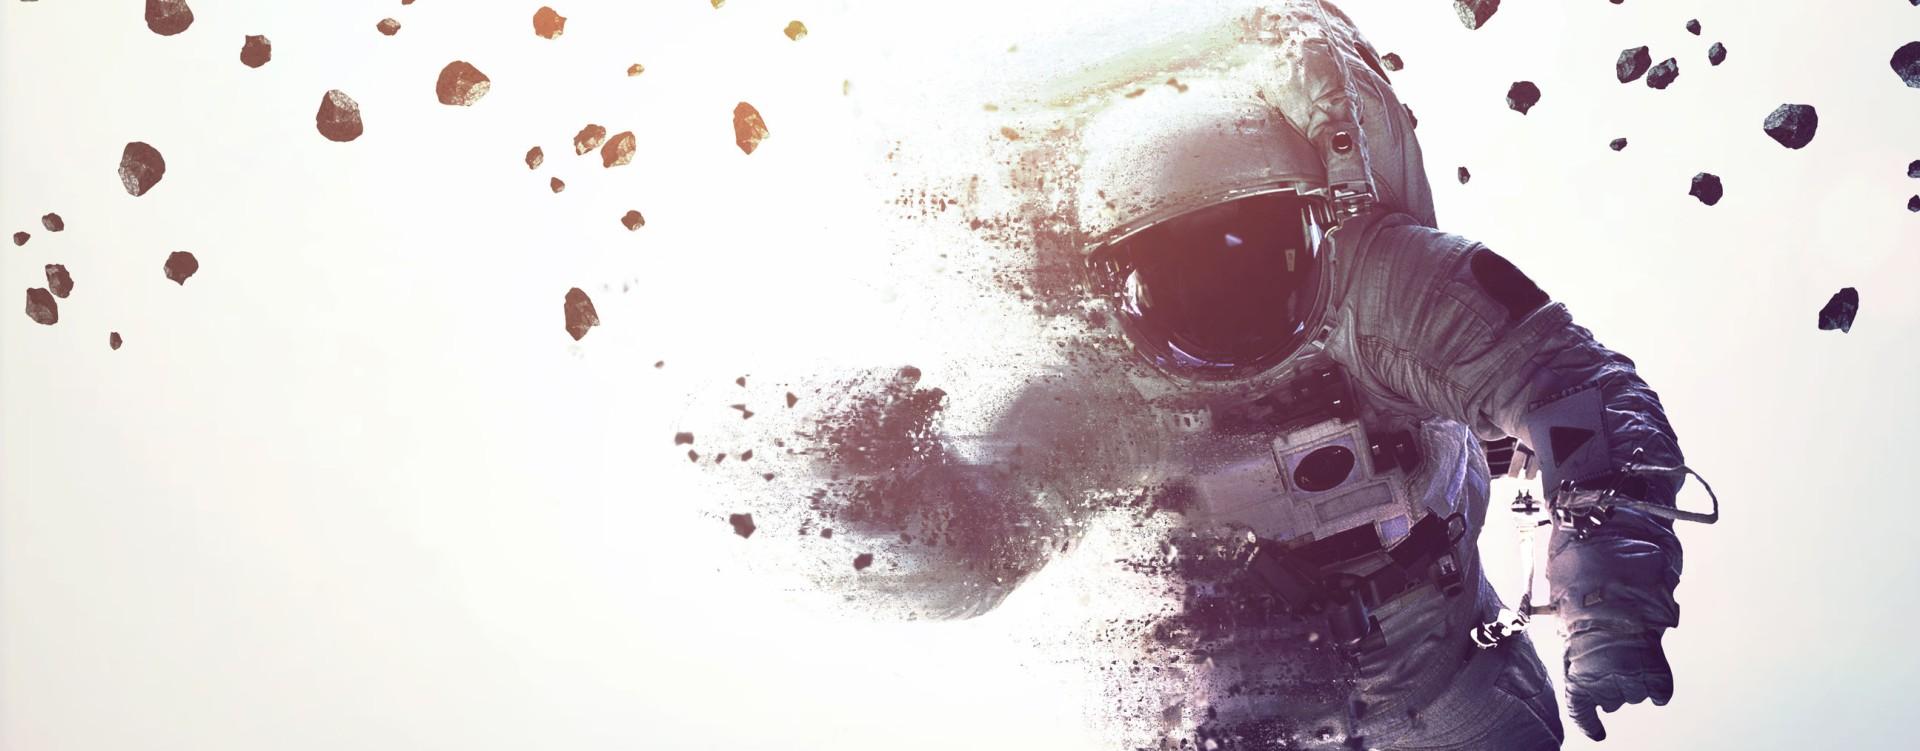 Skyrocketing-Astronaut_web